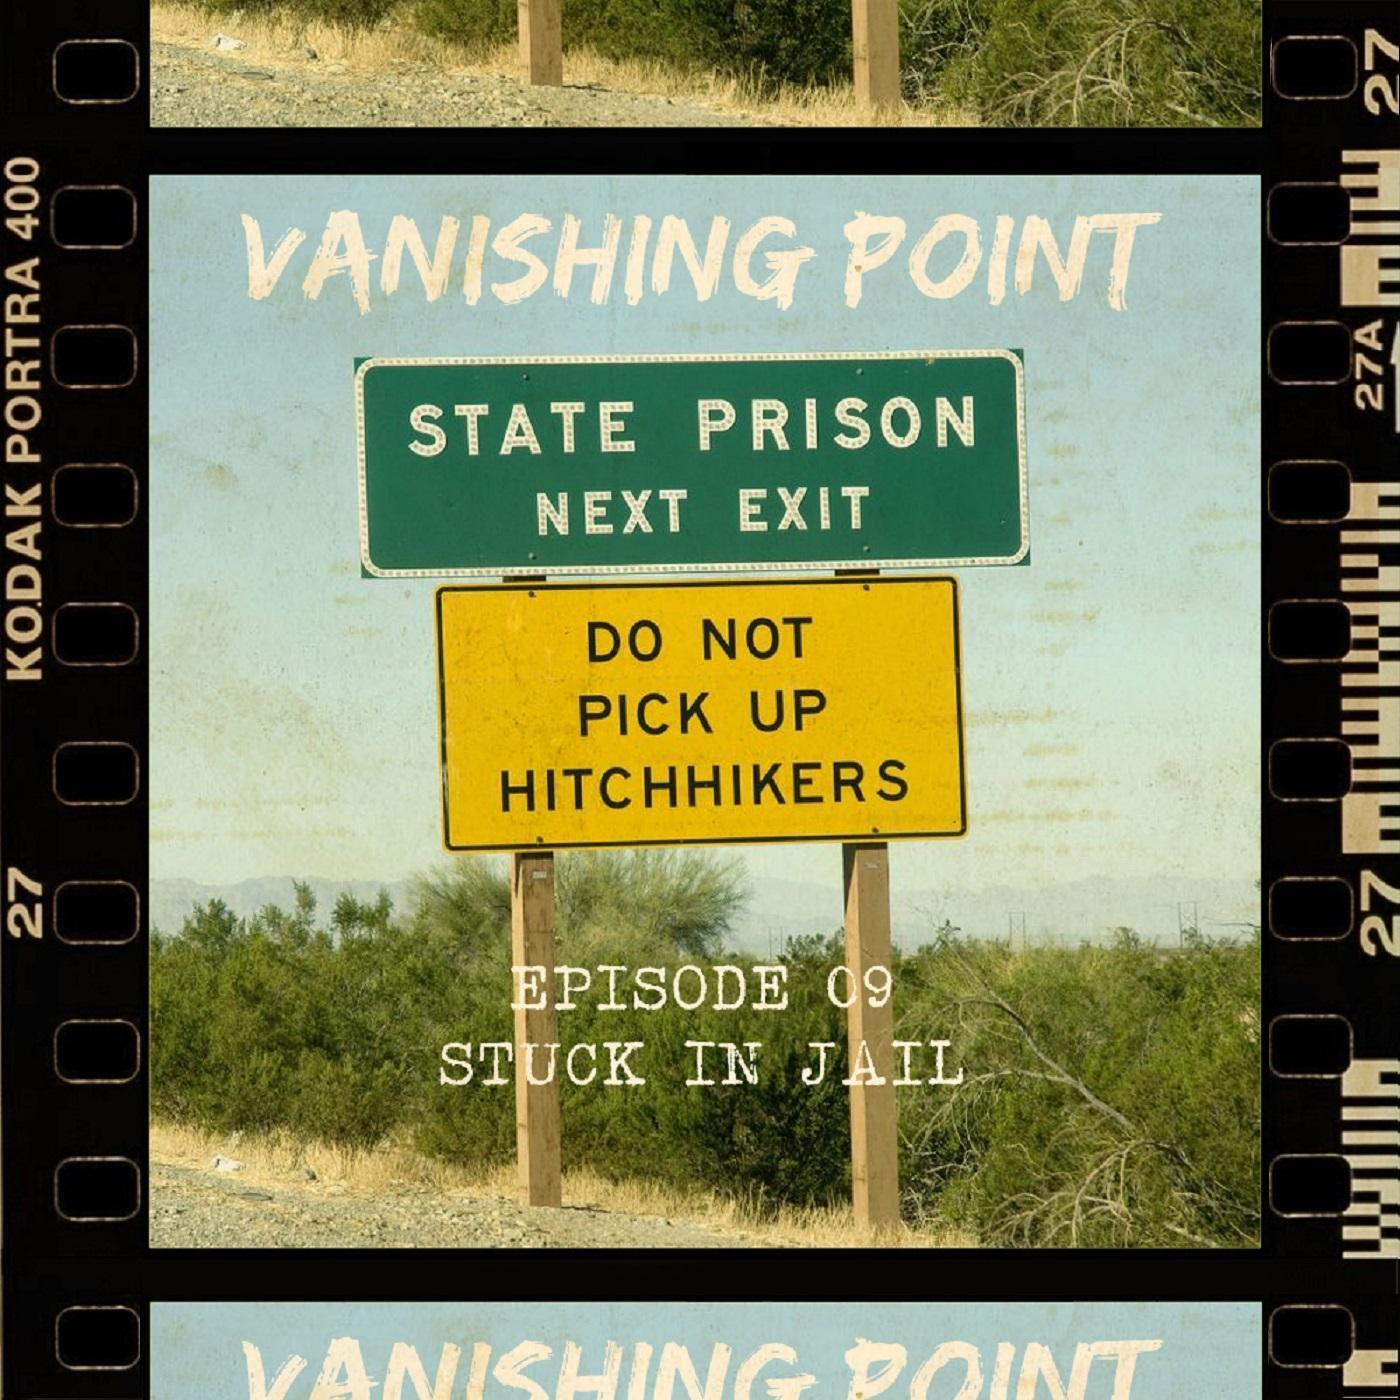 VANISHING POINT #9 - Stuck in jail